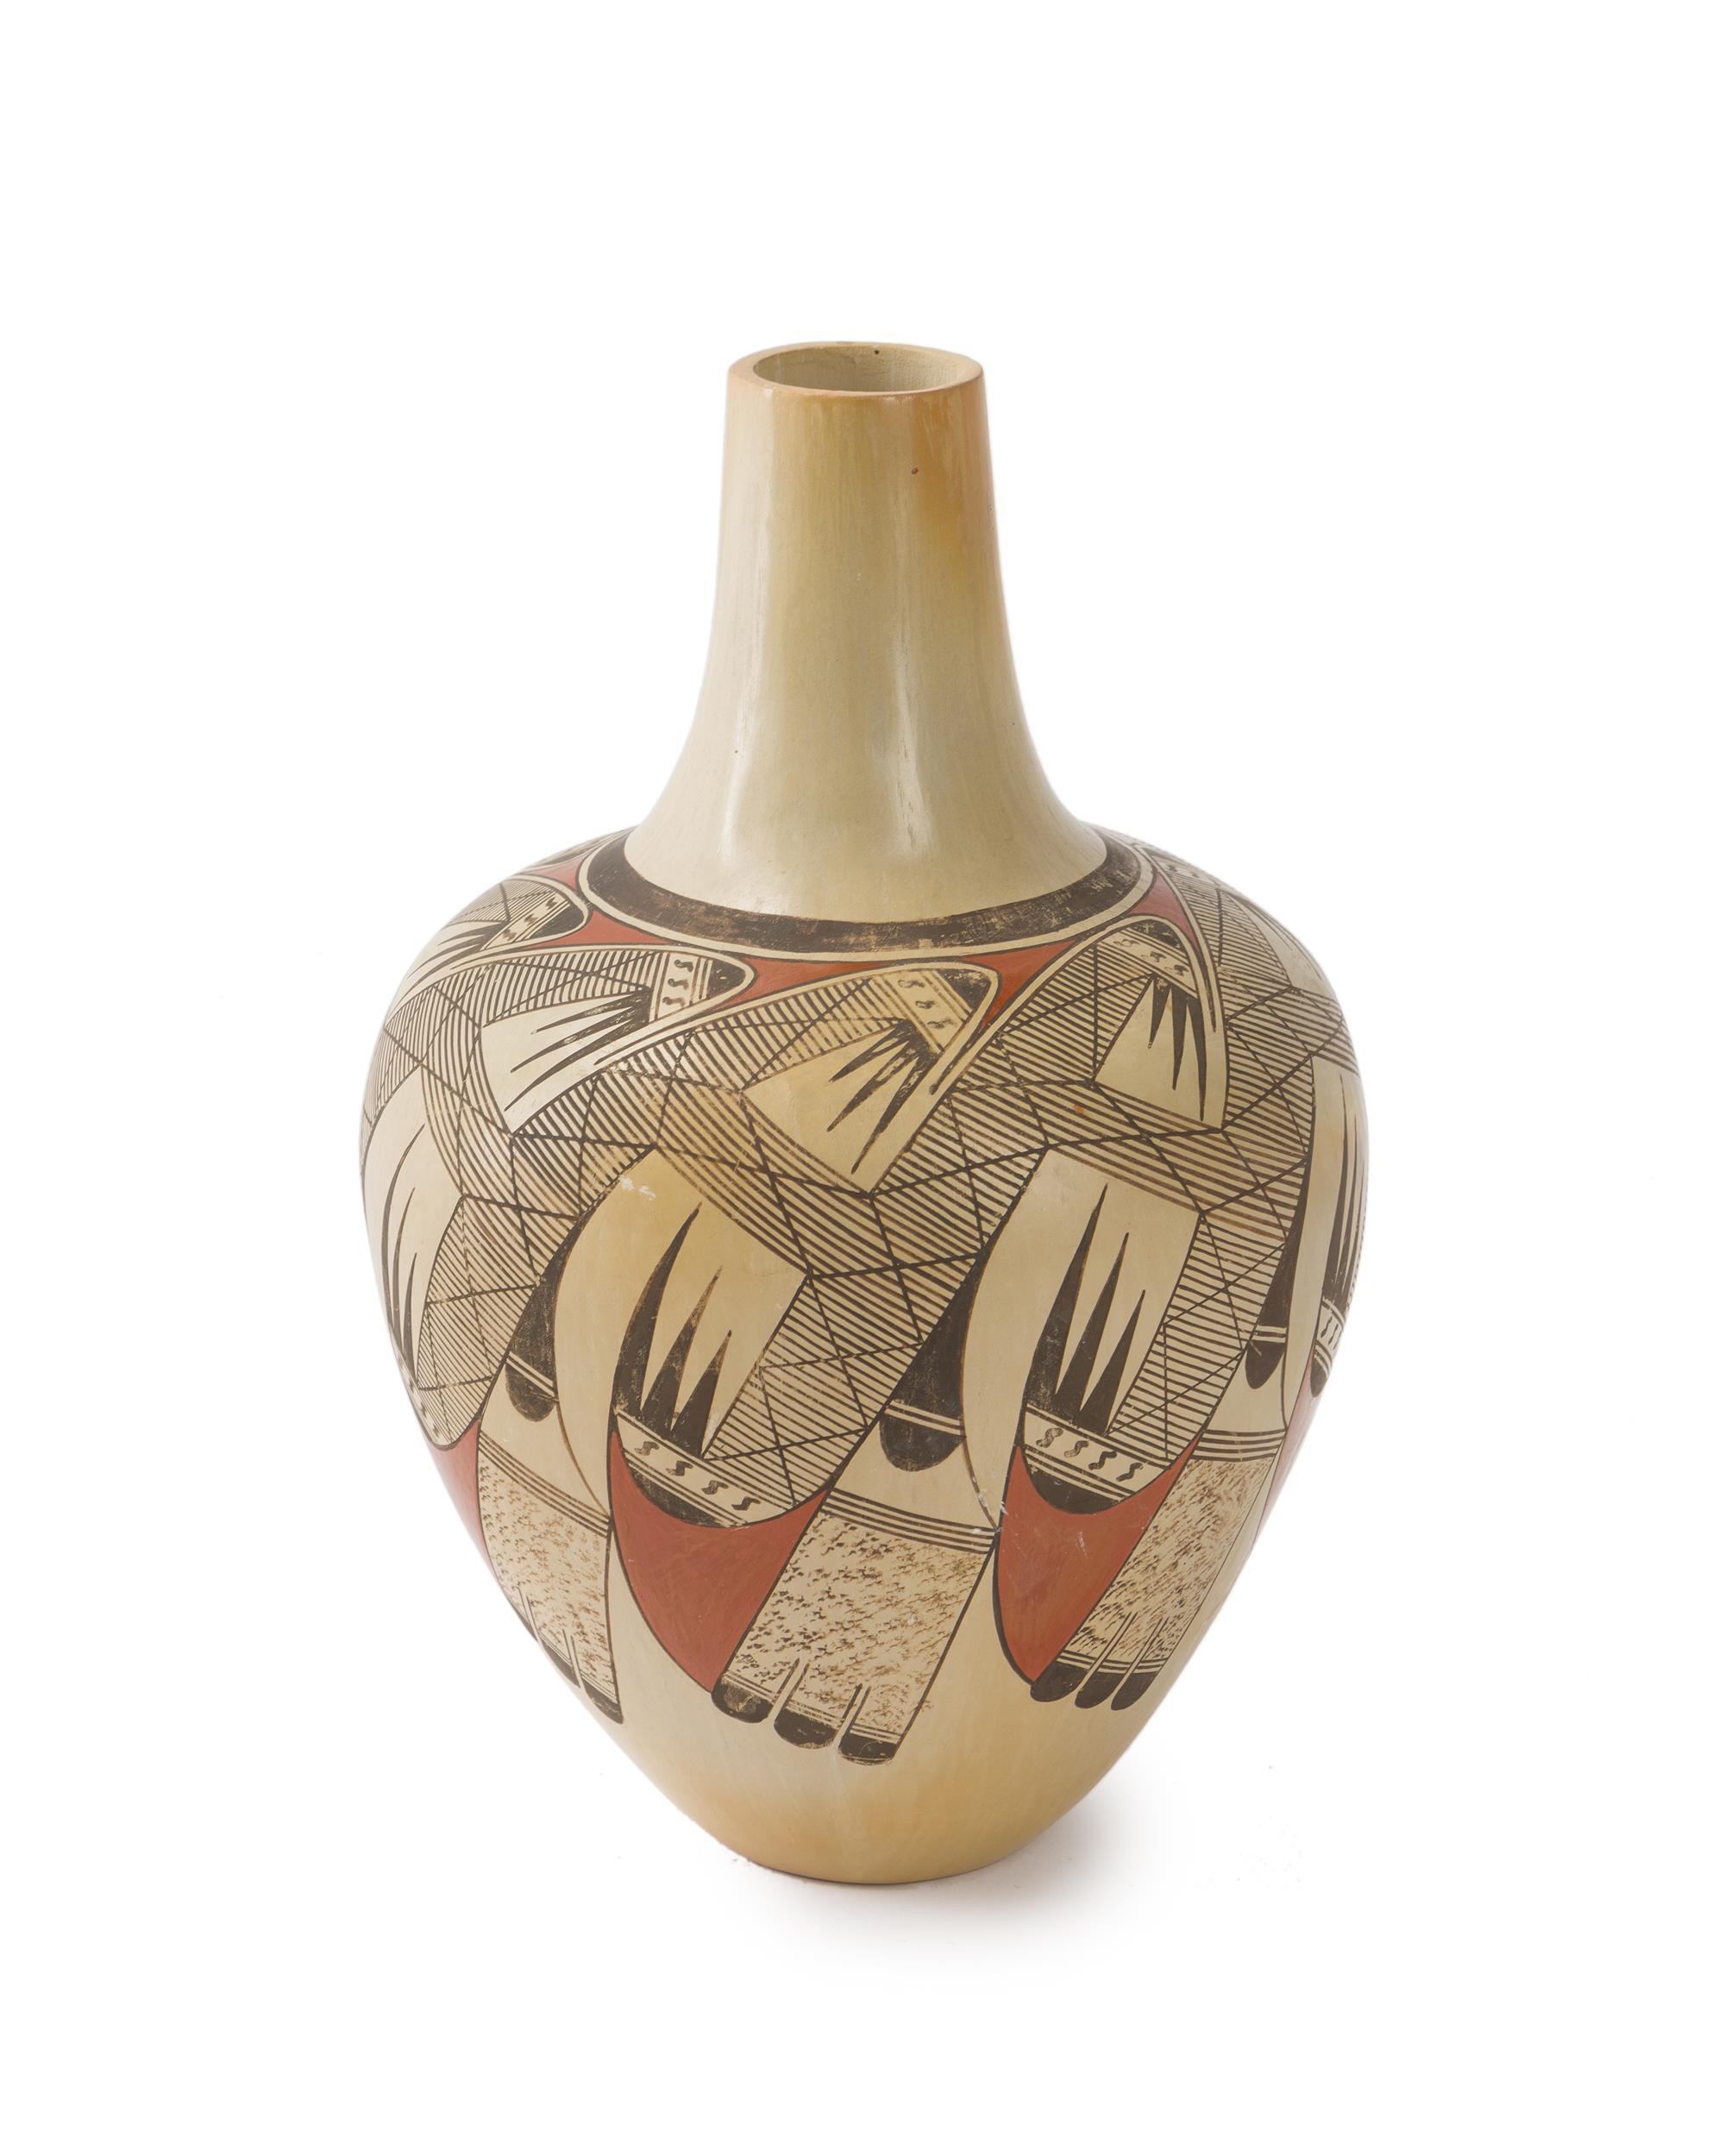 A polychrome shouldered vase, Elton Nampeyo